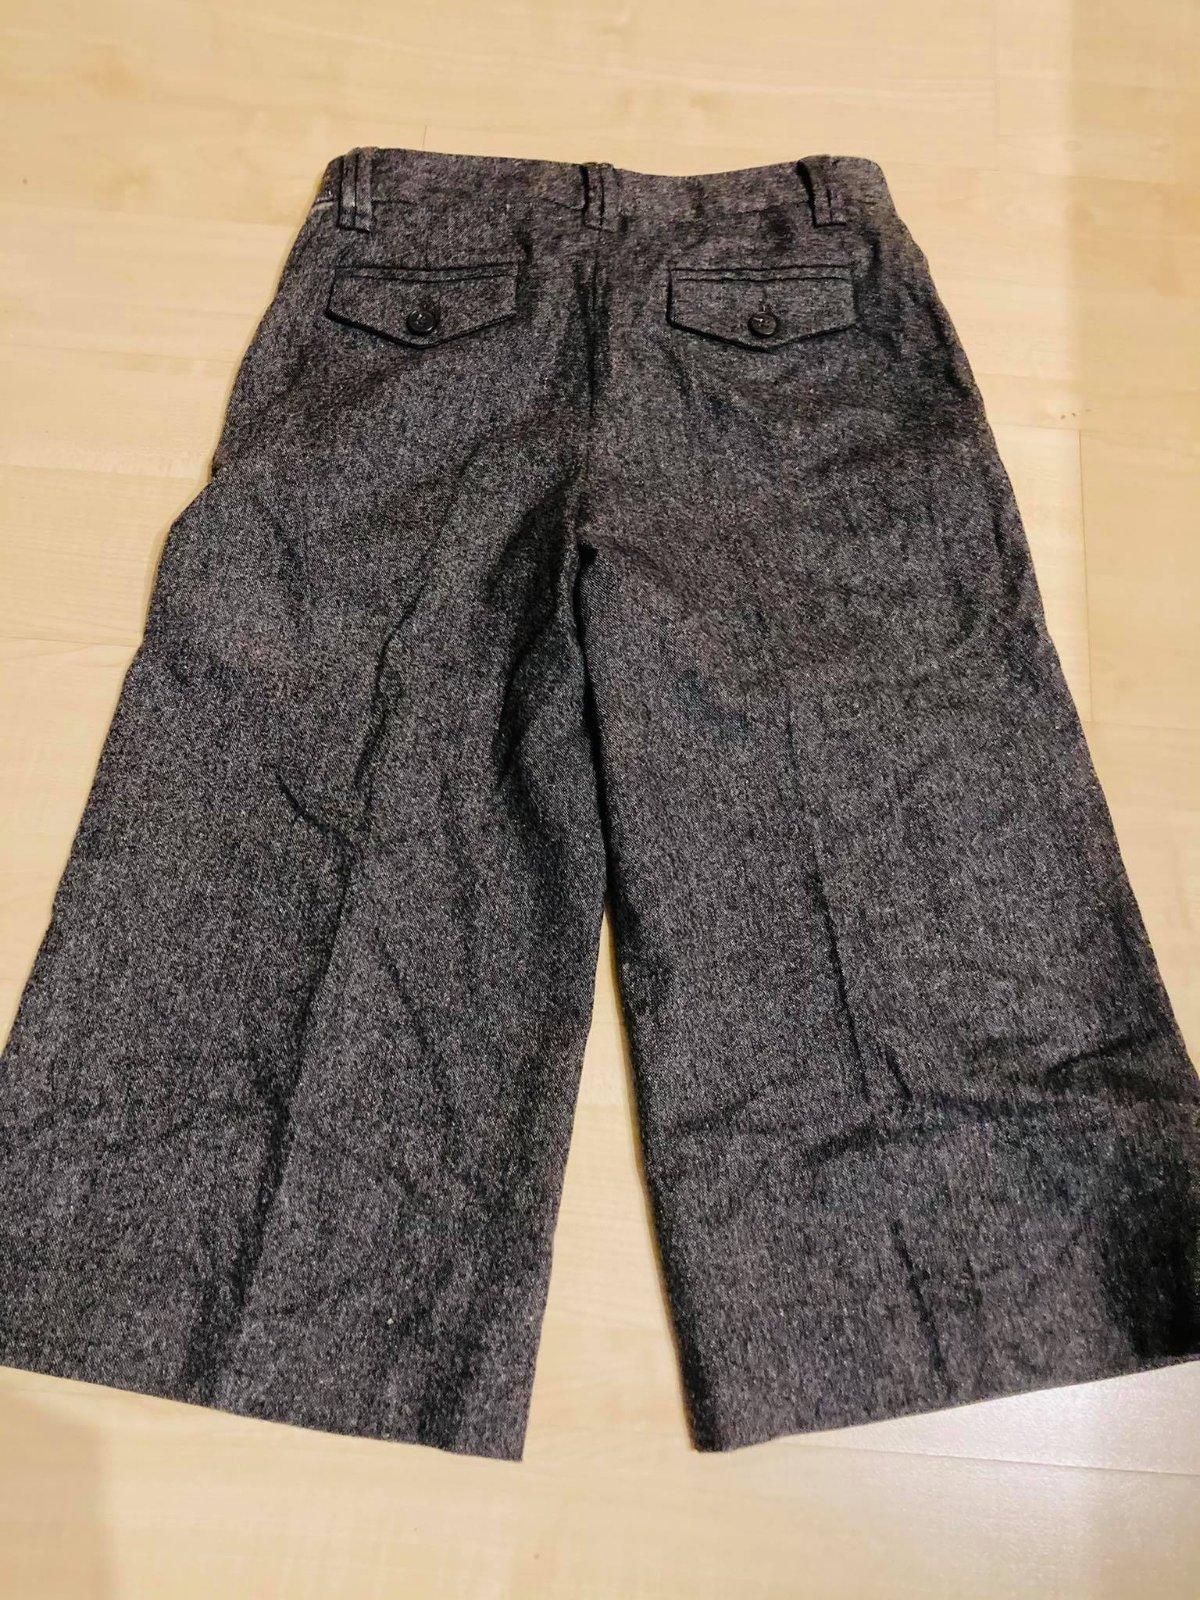 Zara 3/4 nohavice - Obrázok č. 2